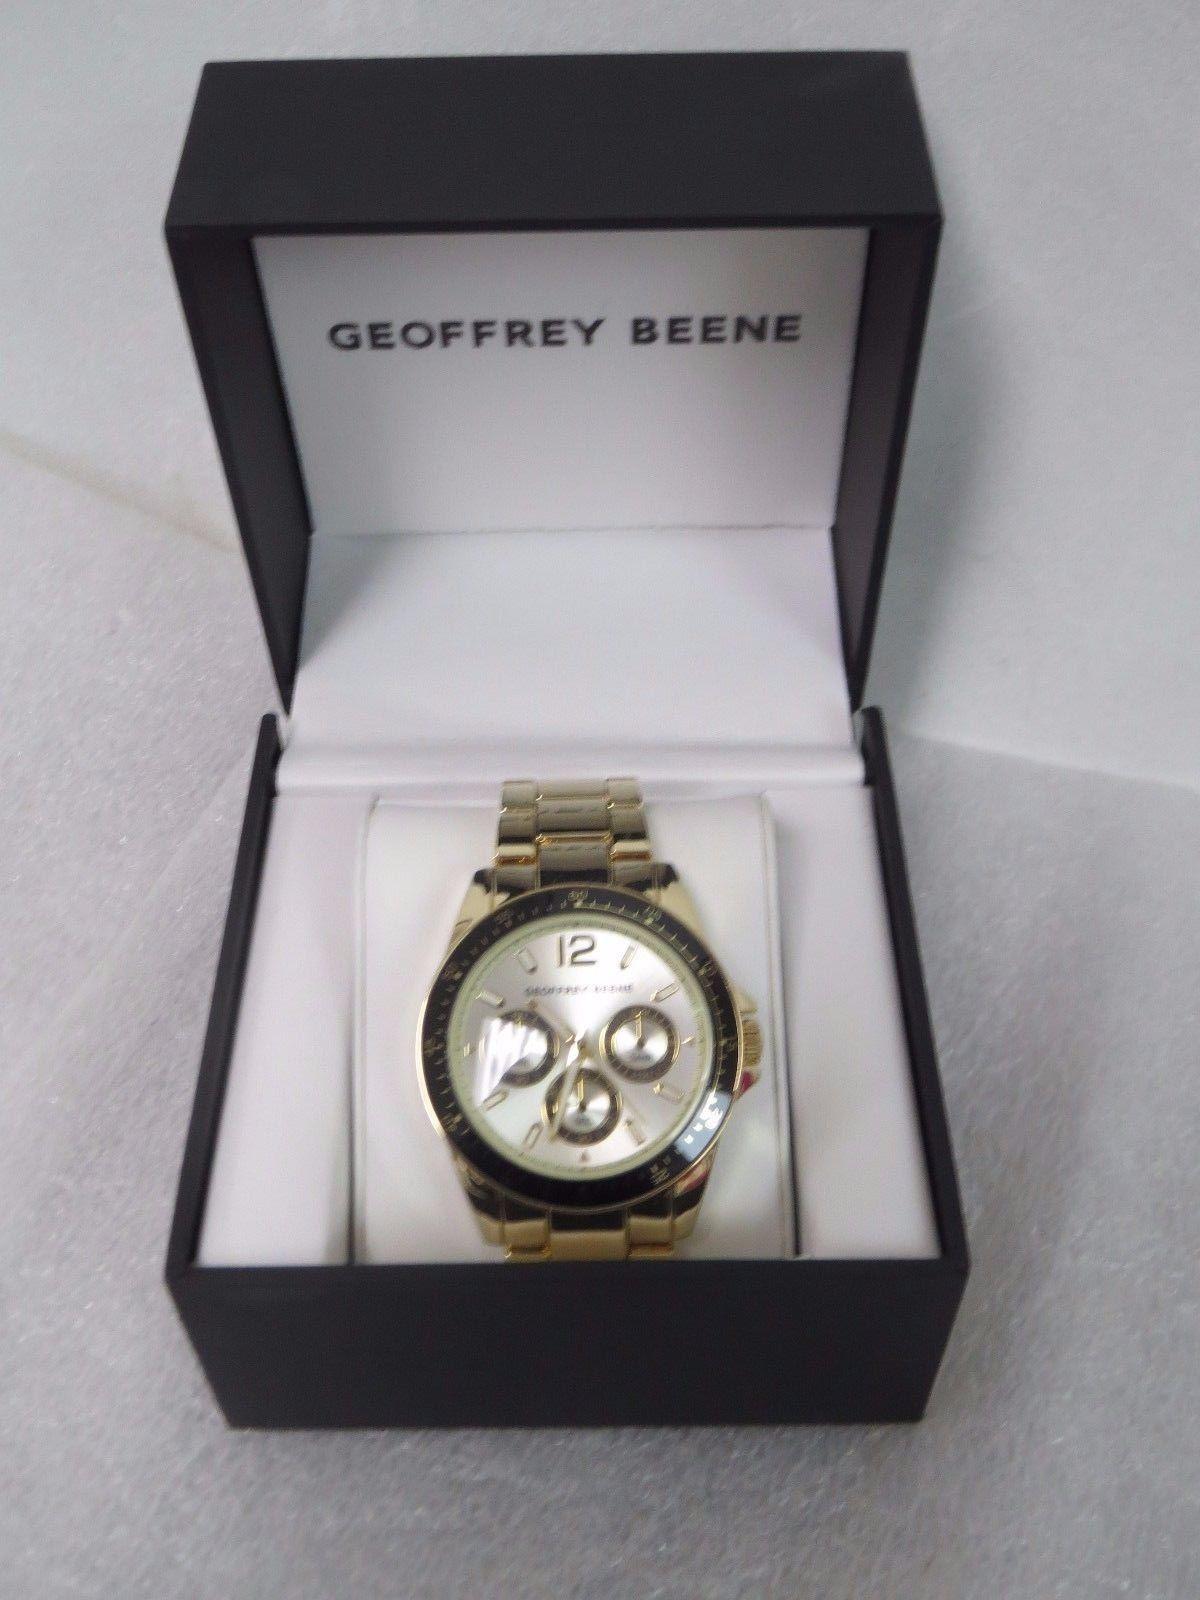 Geoffrey Beene Men's Chronograph Watch SR626SW GOLD TONE